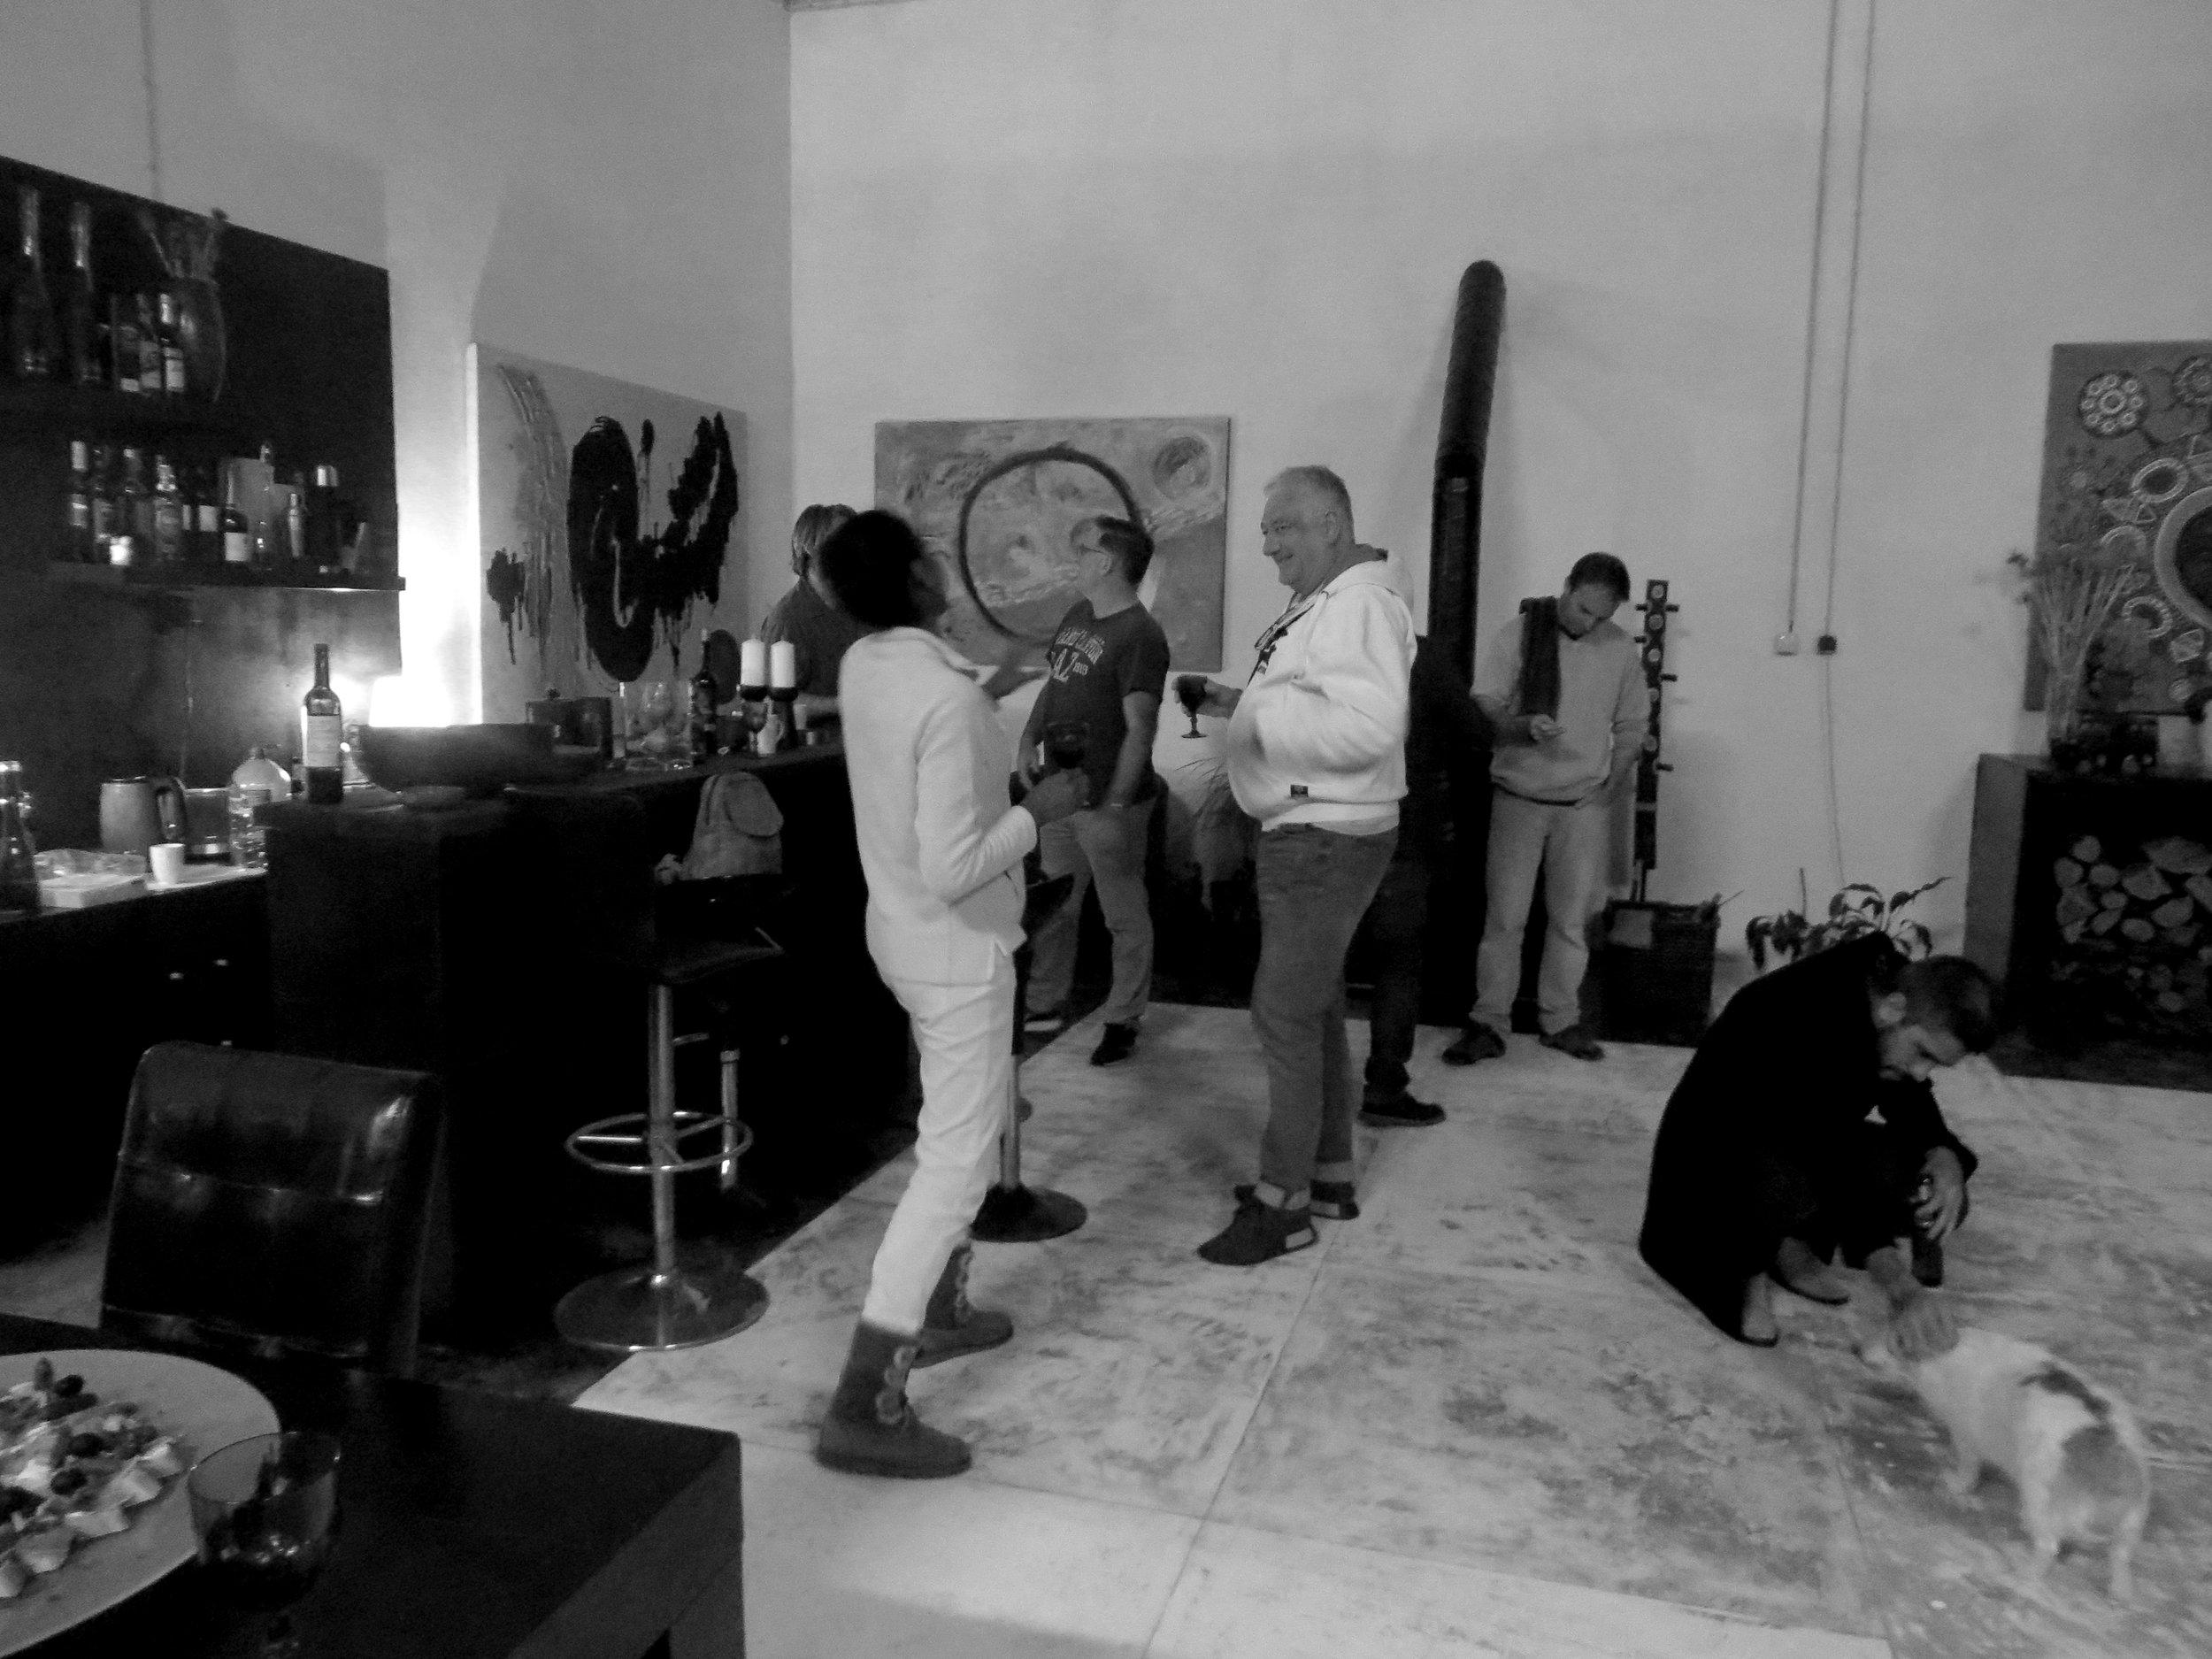 Art-cafe-art-studio-workshop-social.jpg